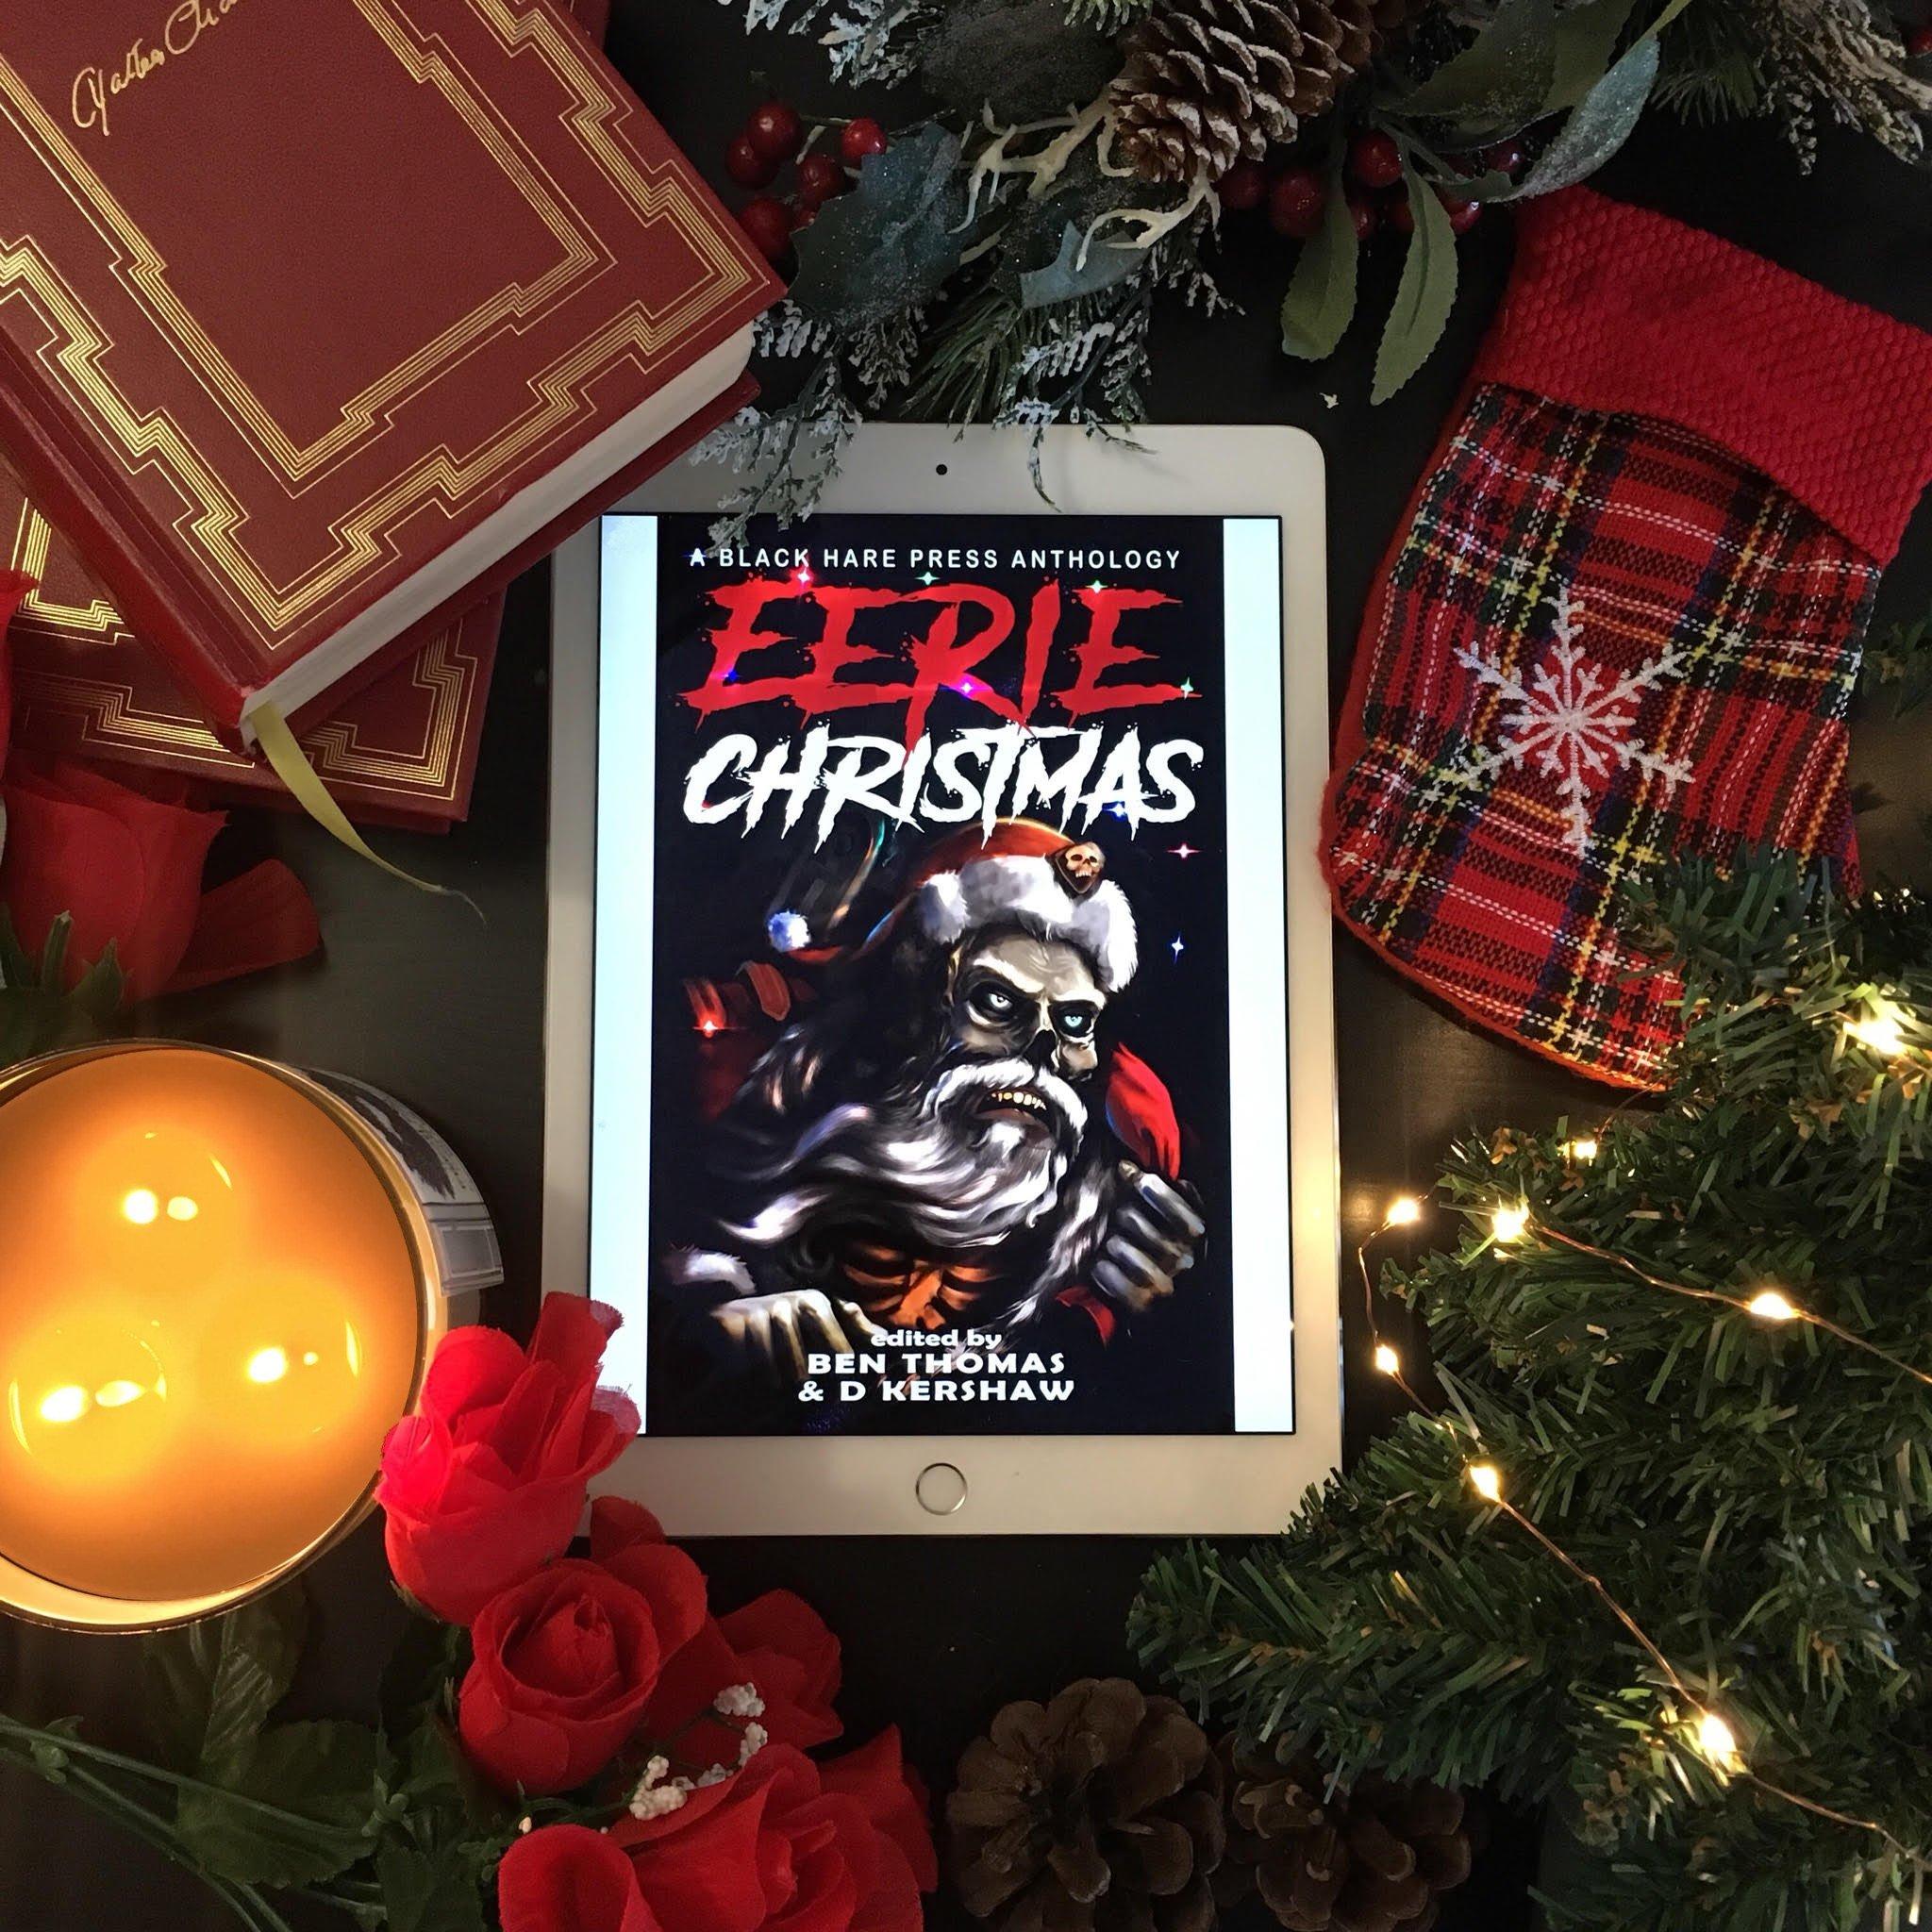 Eerie Christmas on sale now!